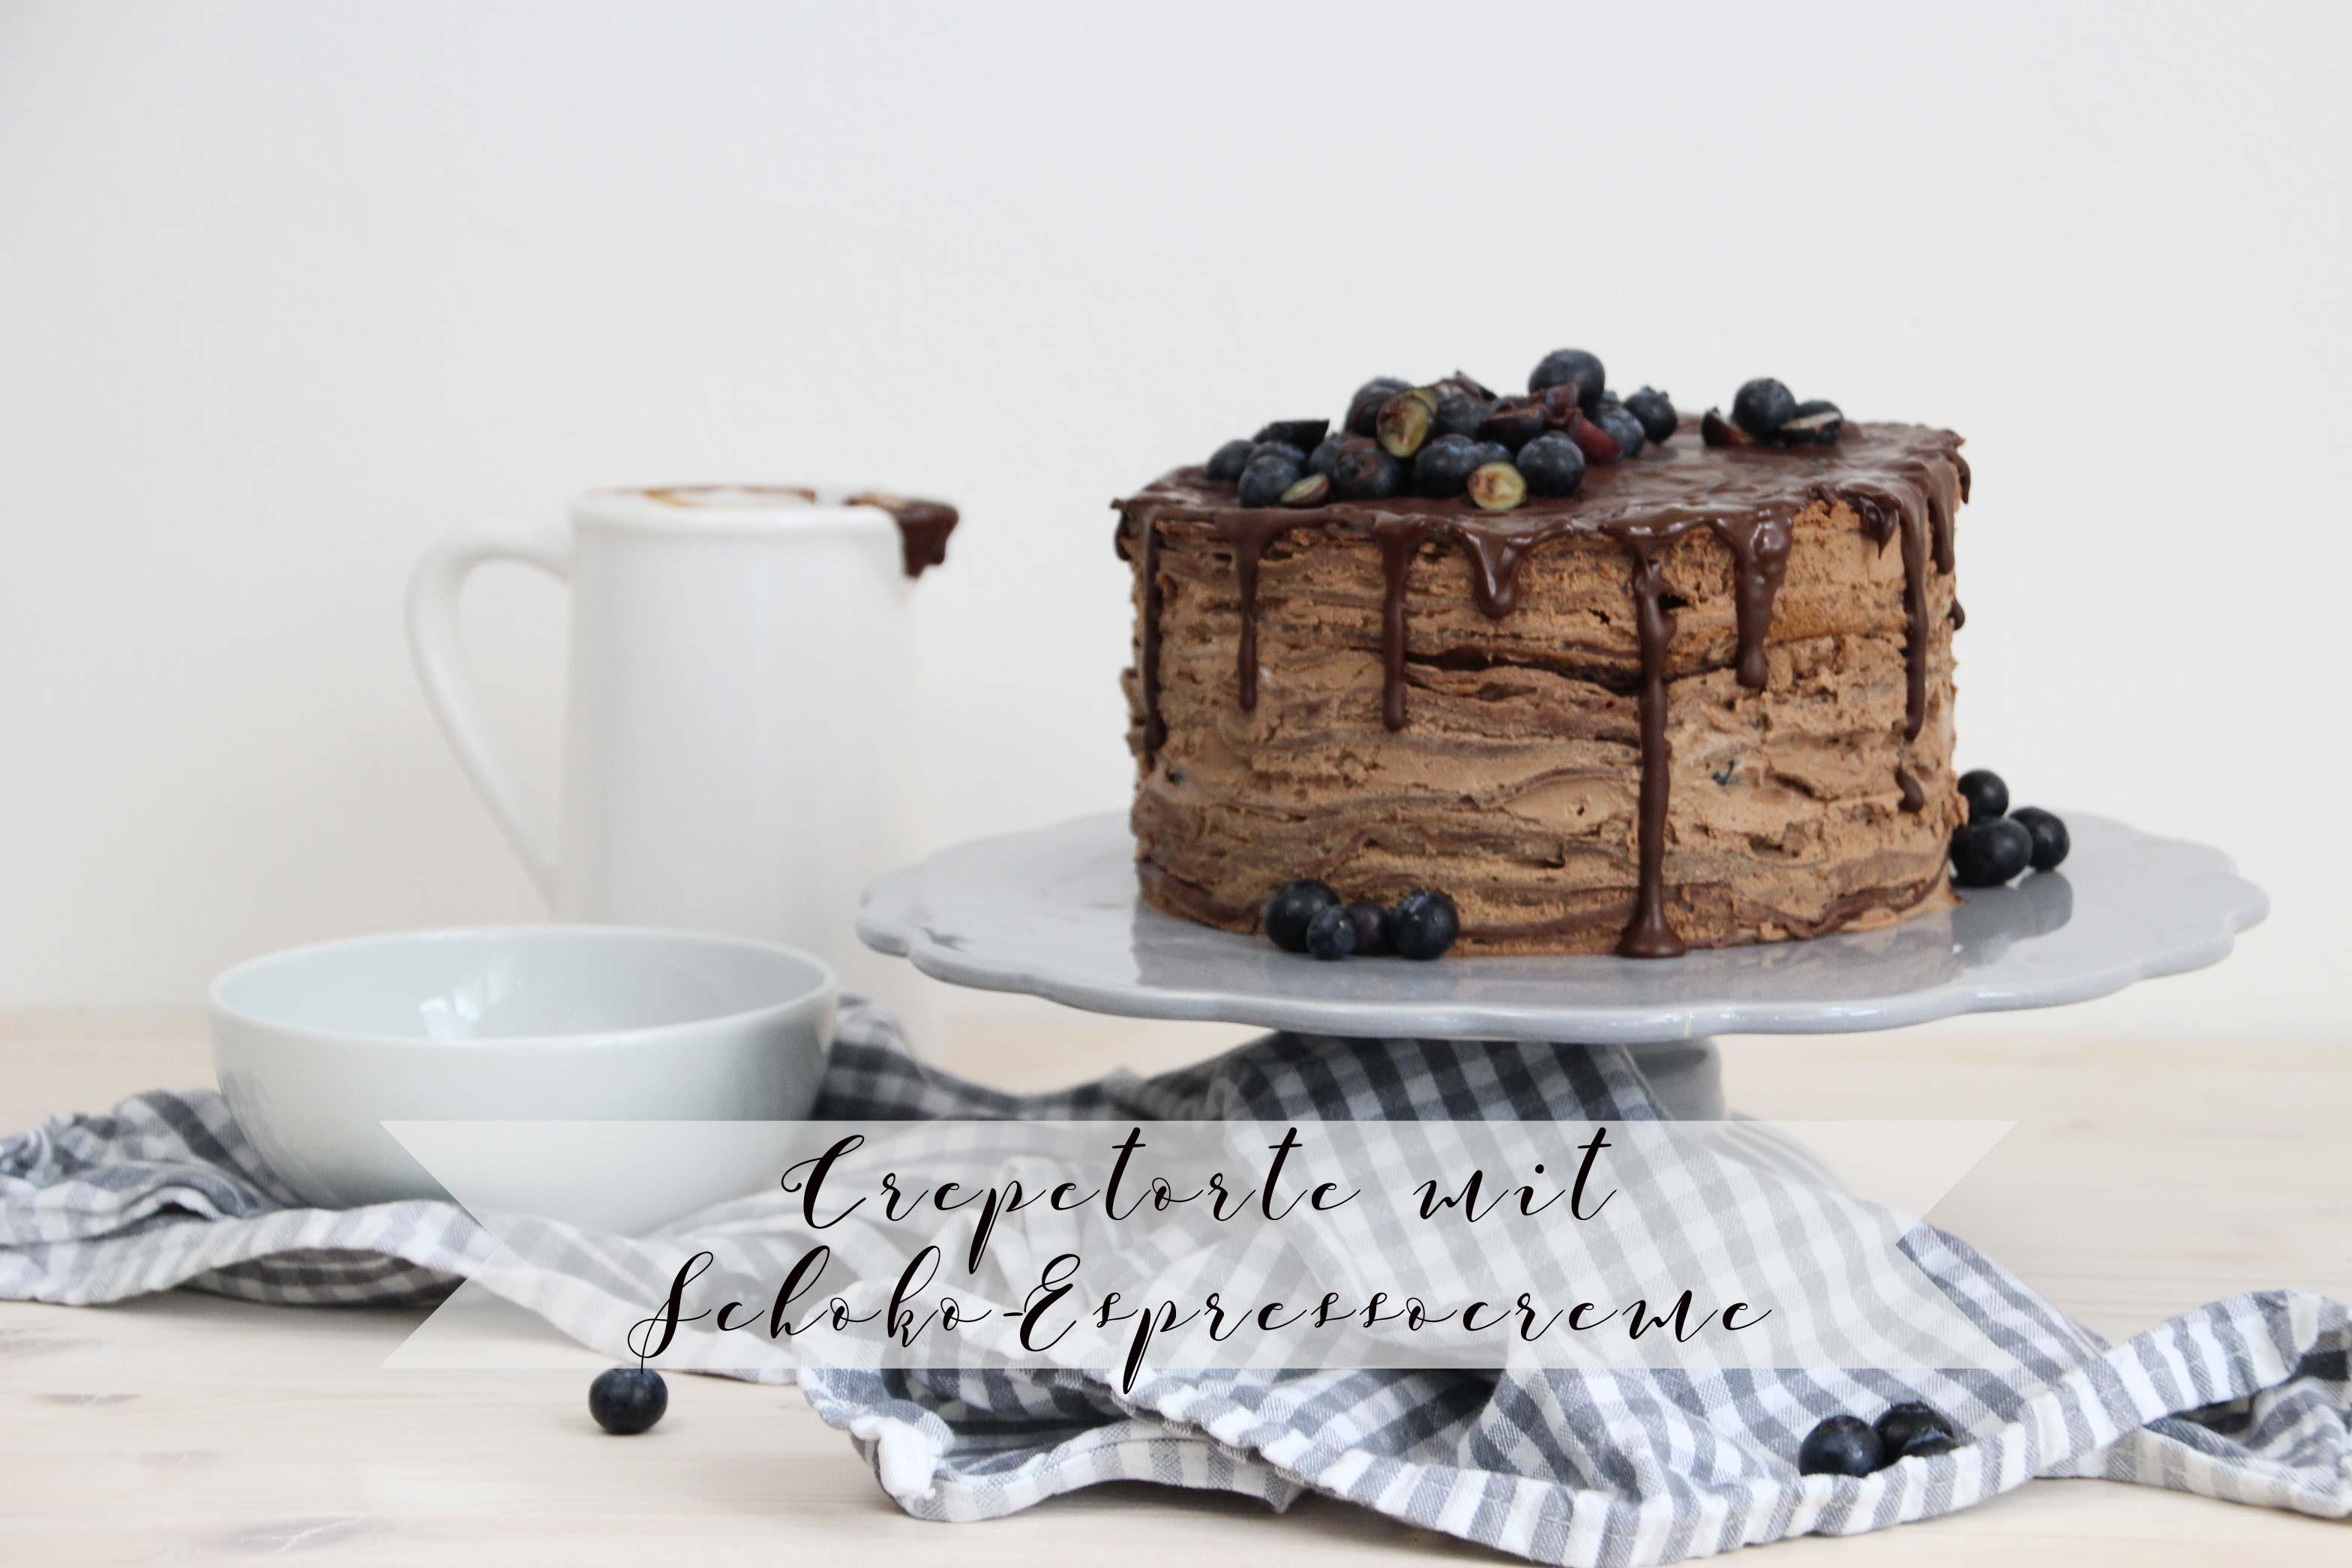 Crepetorte mit Espresso-Schokocreme